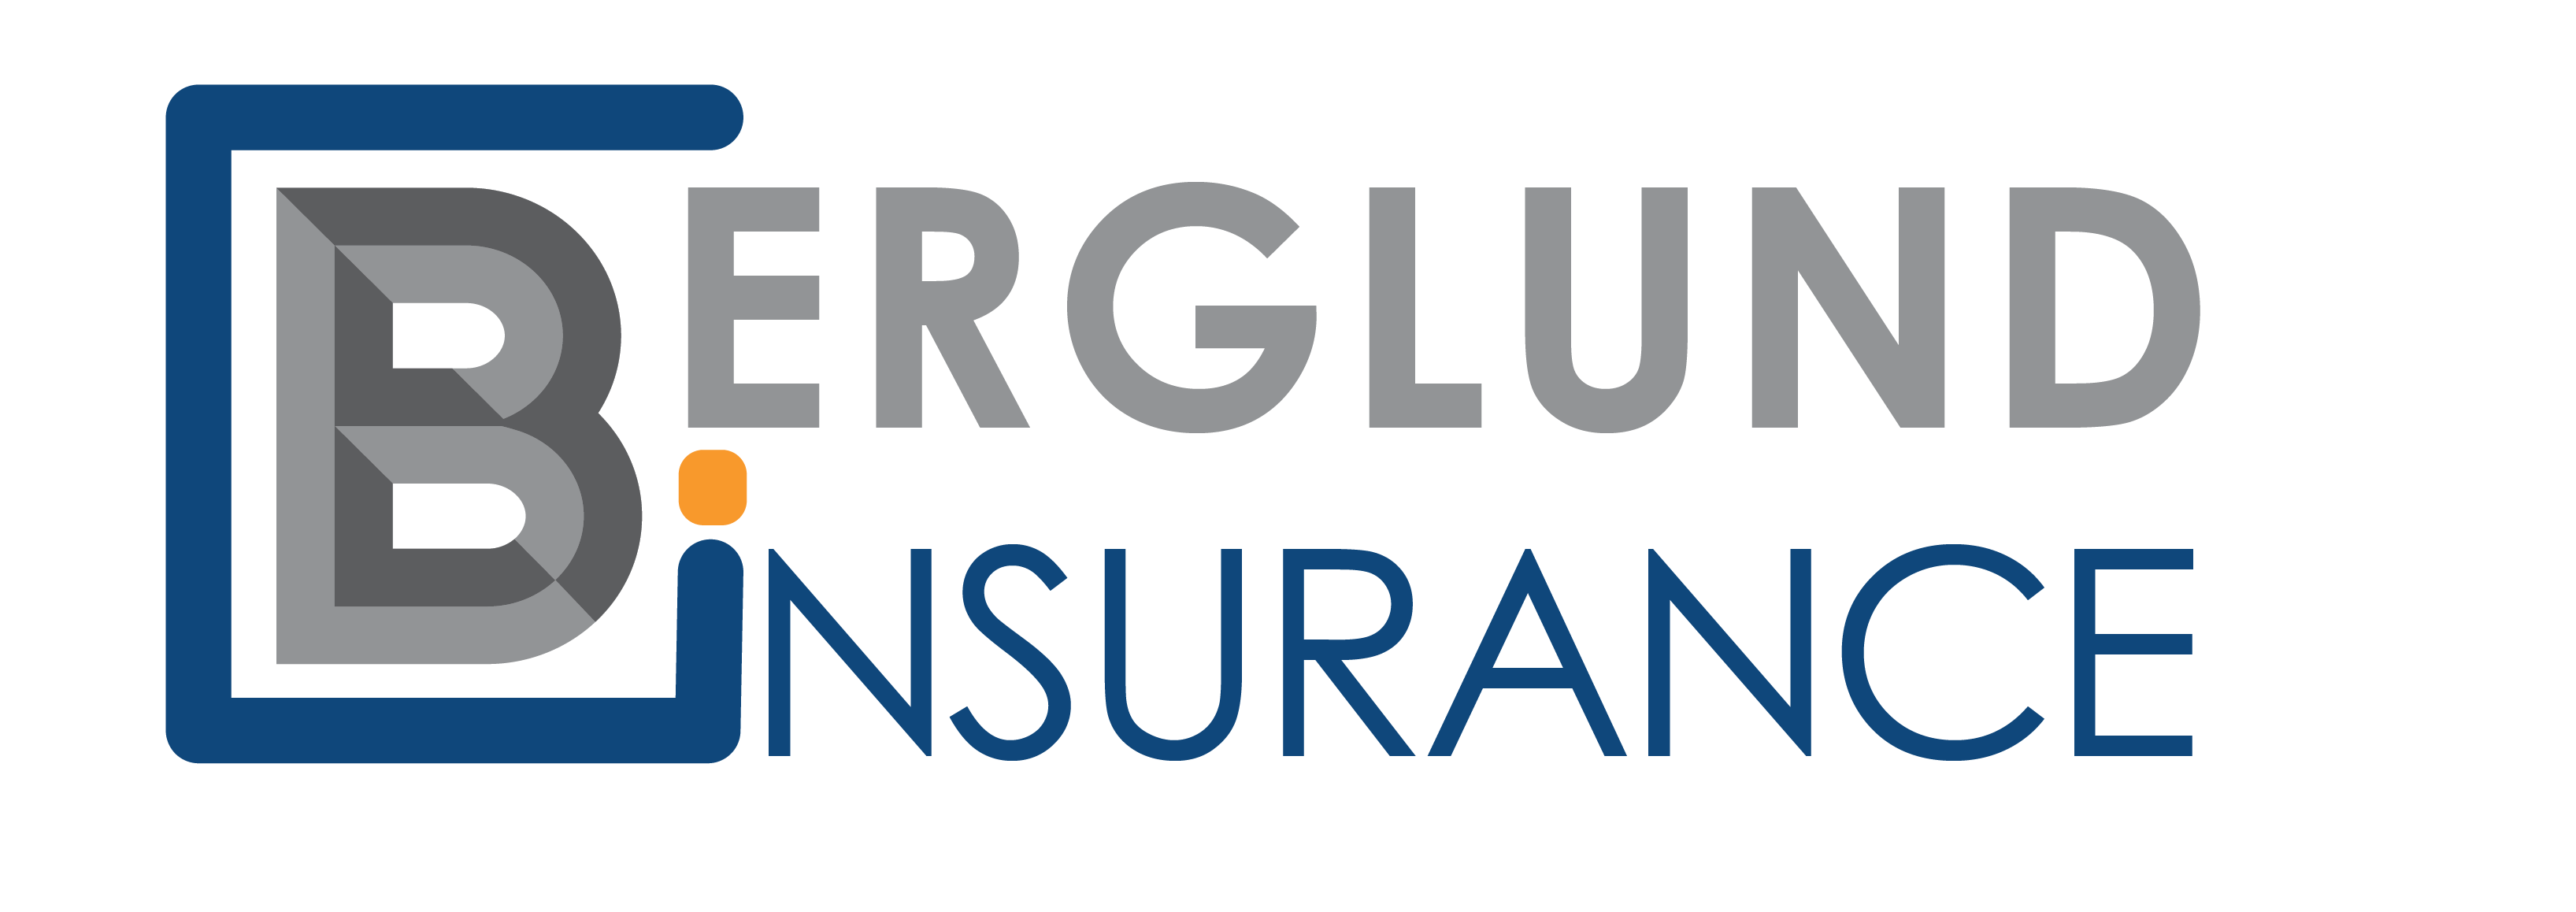 Logo- BERGLUND iNSURANCE.png